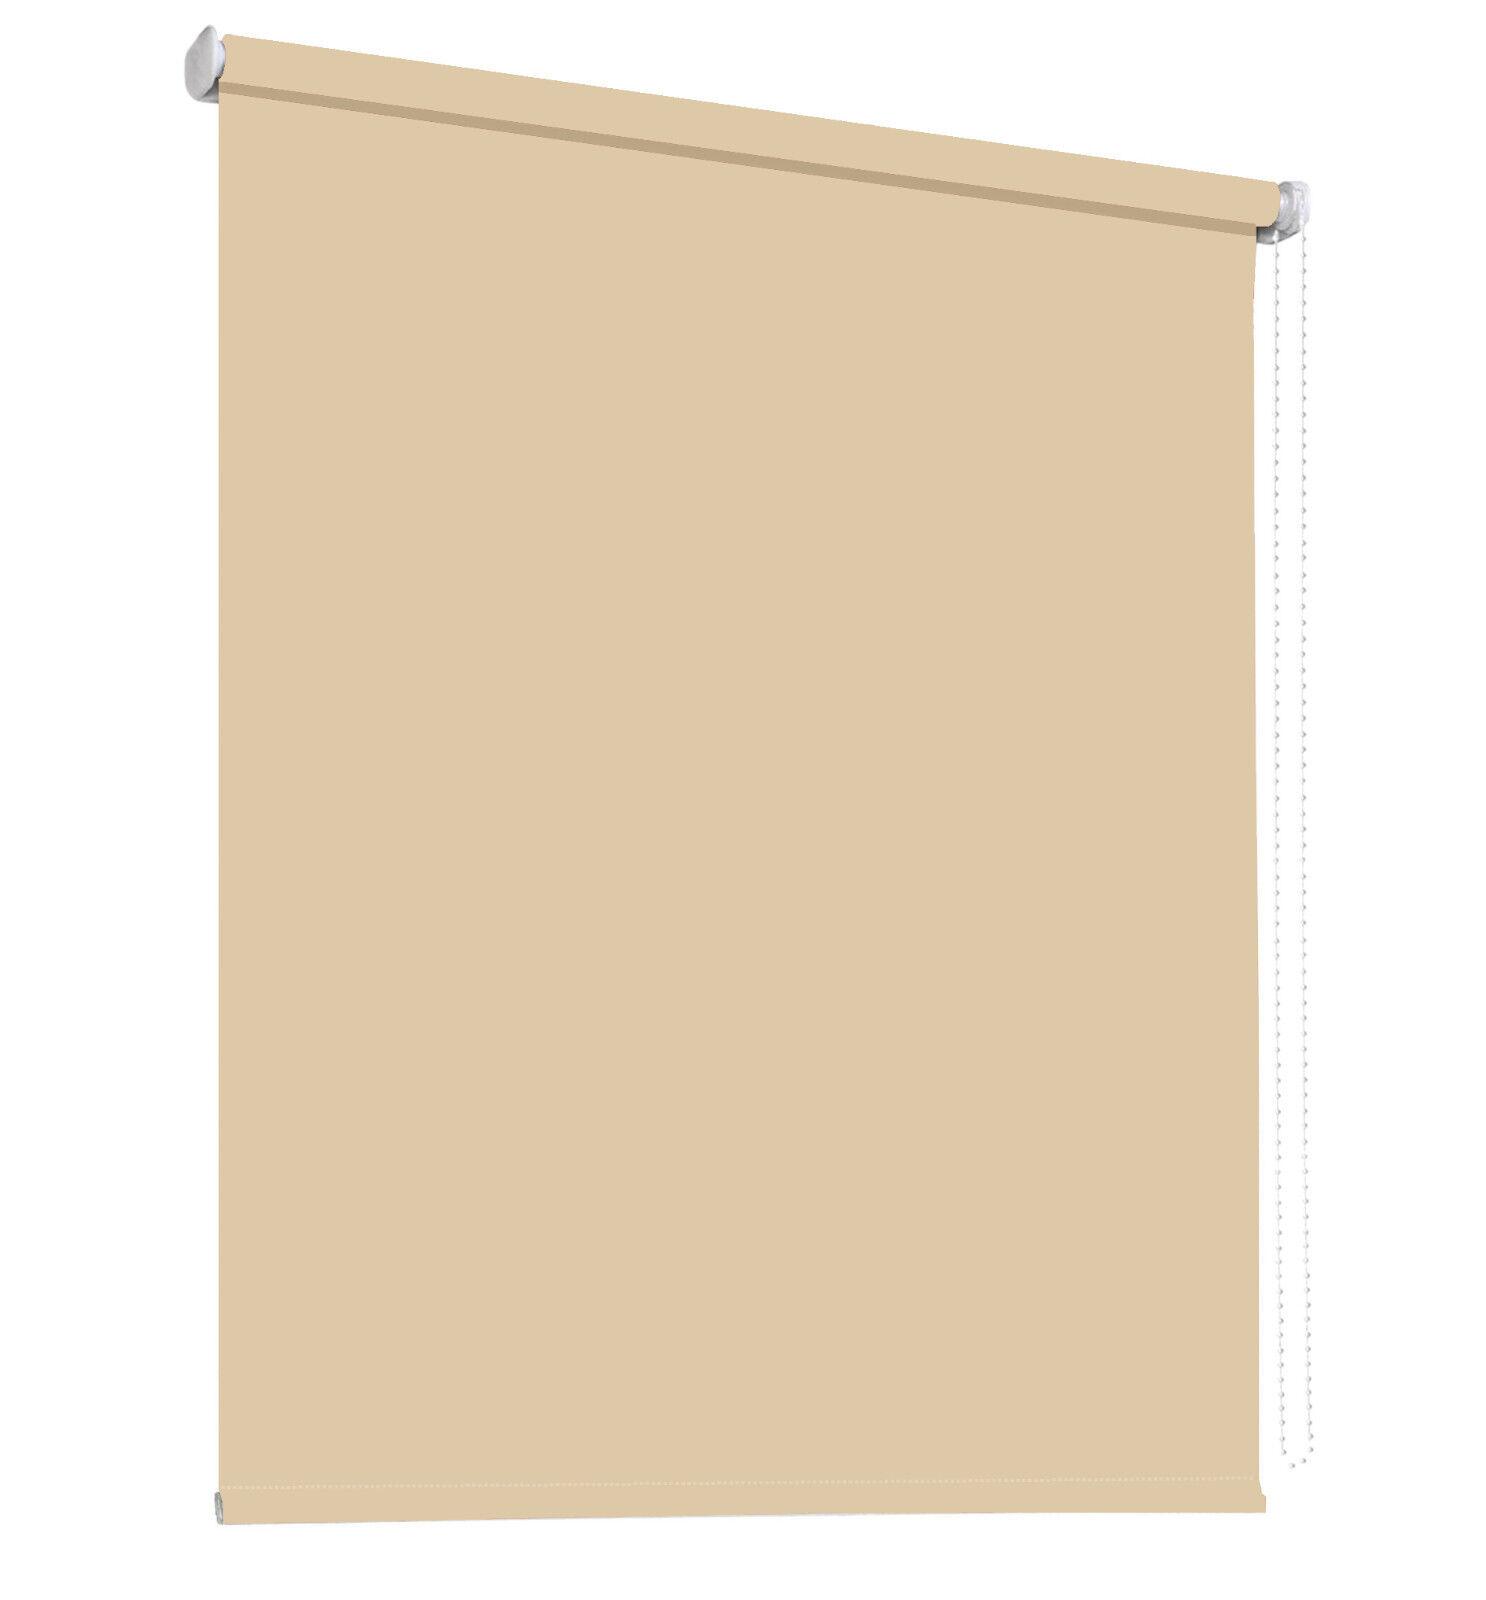 ThermGoldllo Verdunkelungsrollo Tageslichtrollo Tageslichtrollo Tageslichtrollo Seitenzug Rollo Fenster Vorhang | Sale Outlet  8bd800